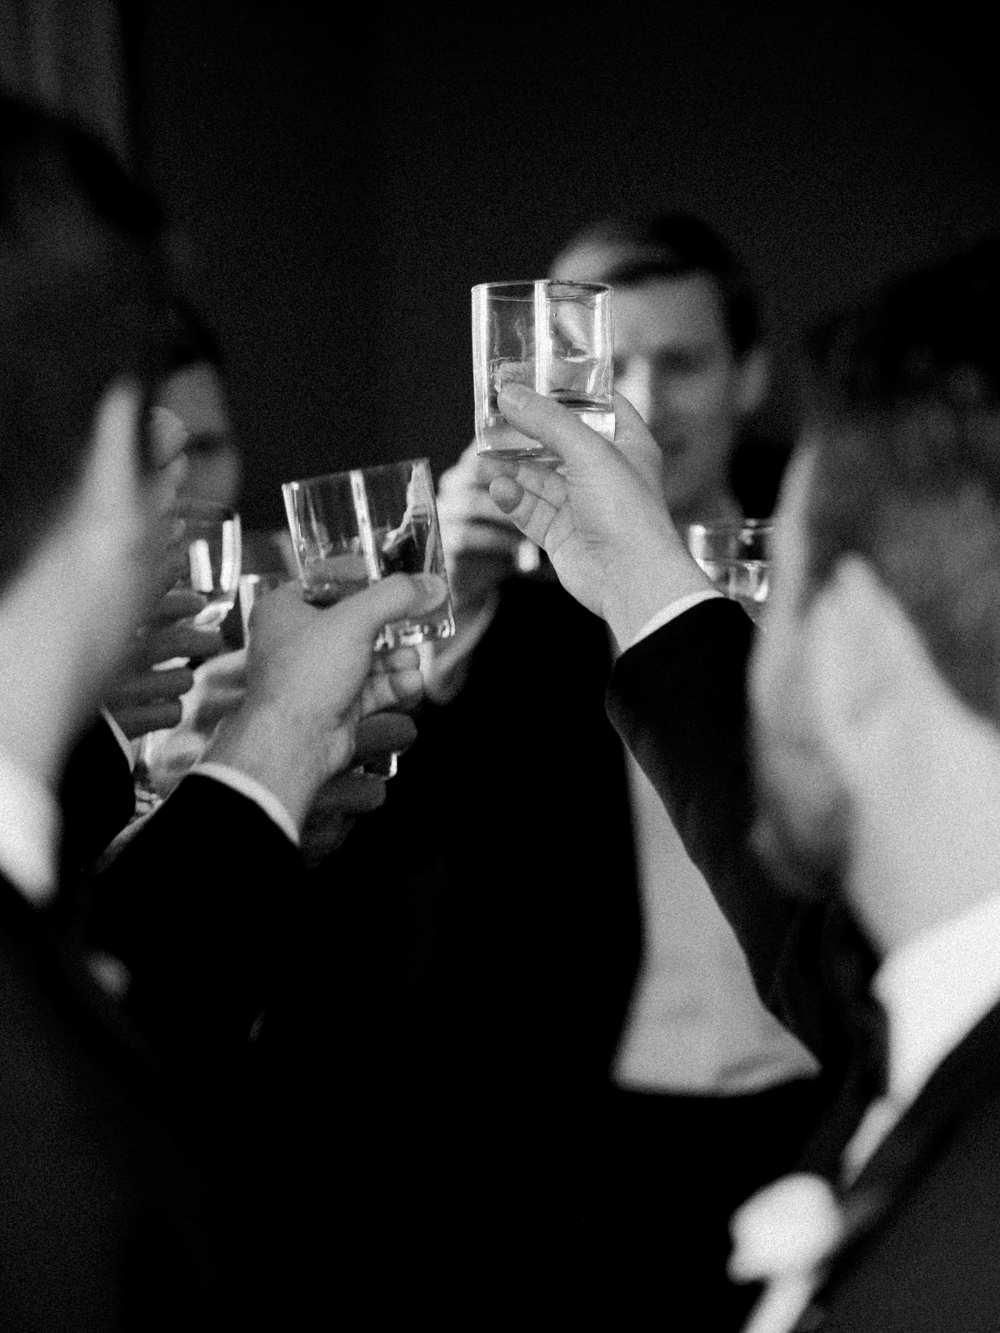 Christine Gosch - destination film photographer - houston wedding photographer - fine art film photographer - elopement photographer - destination wedding - understated wedding - simple beautiful wedding photography-67.jpg